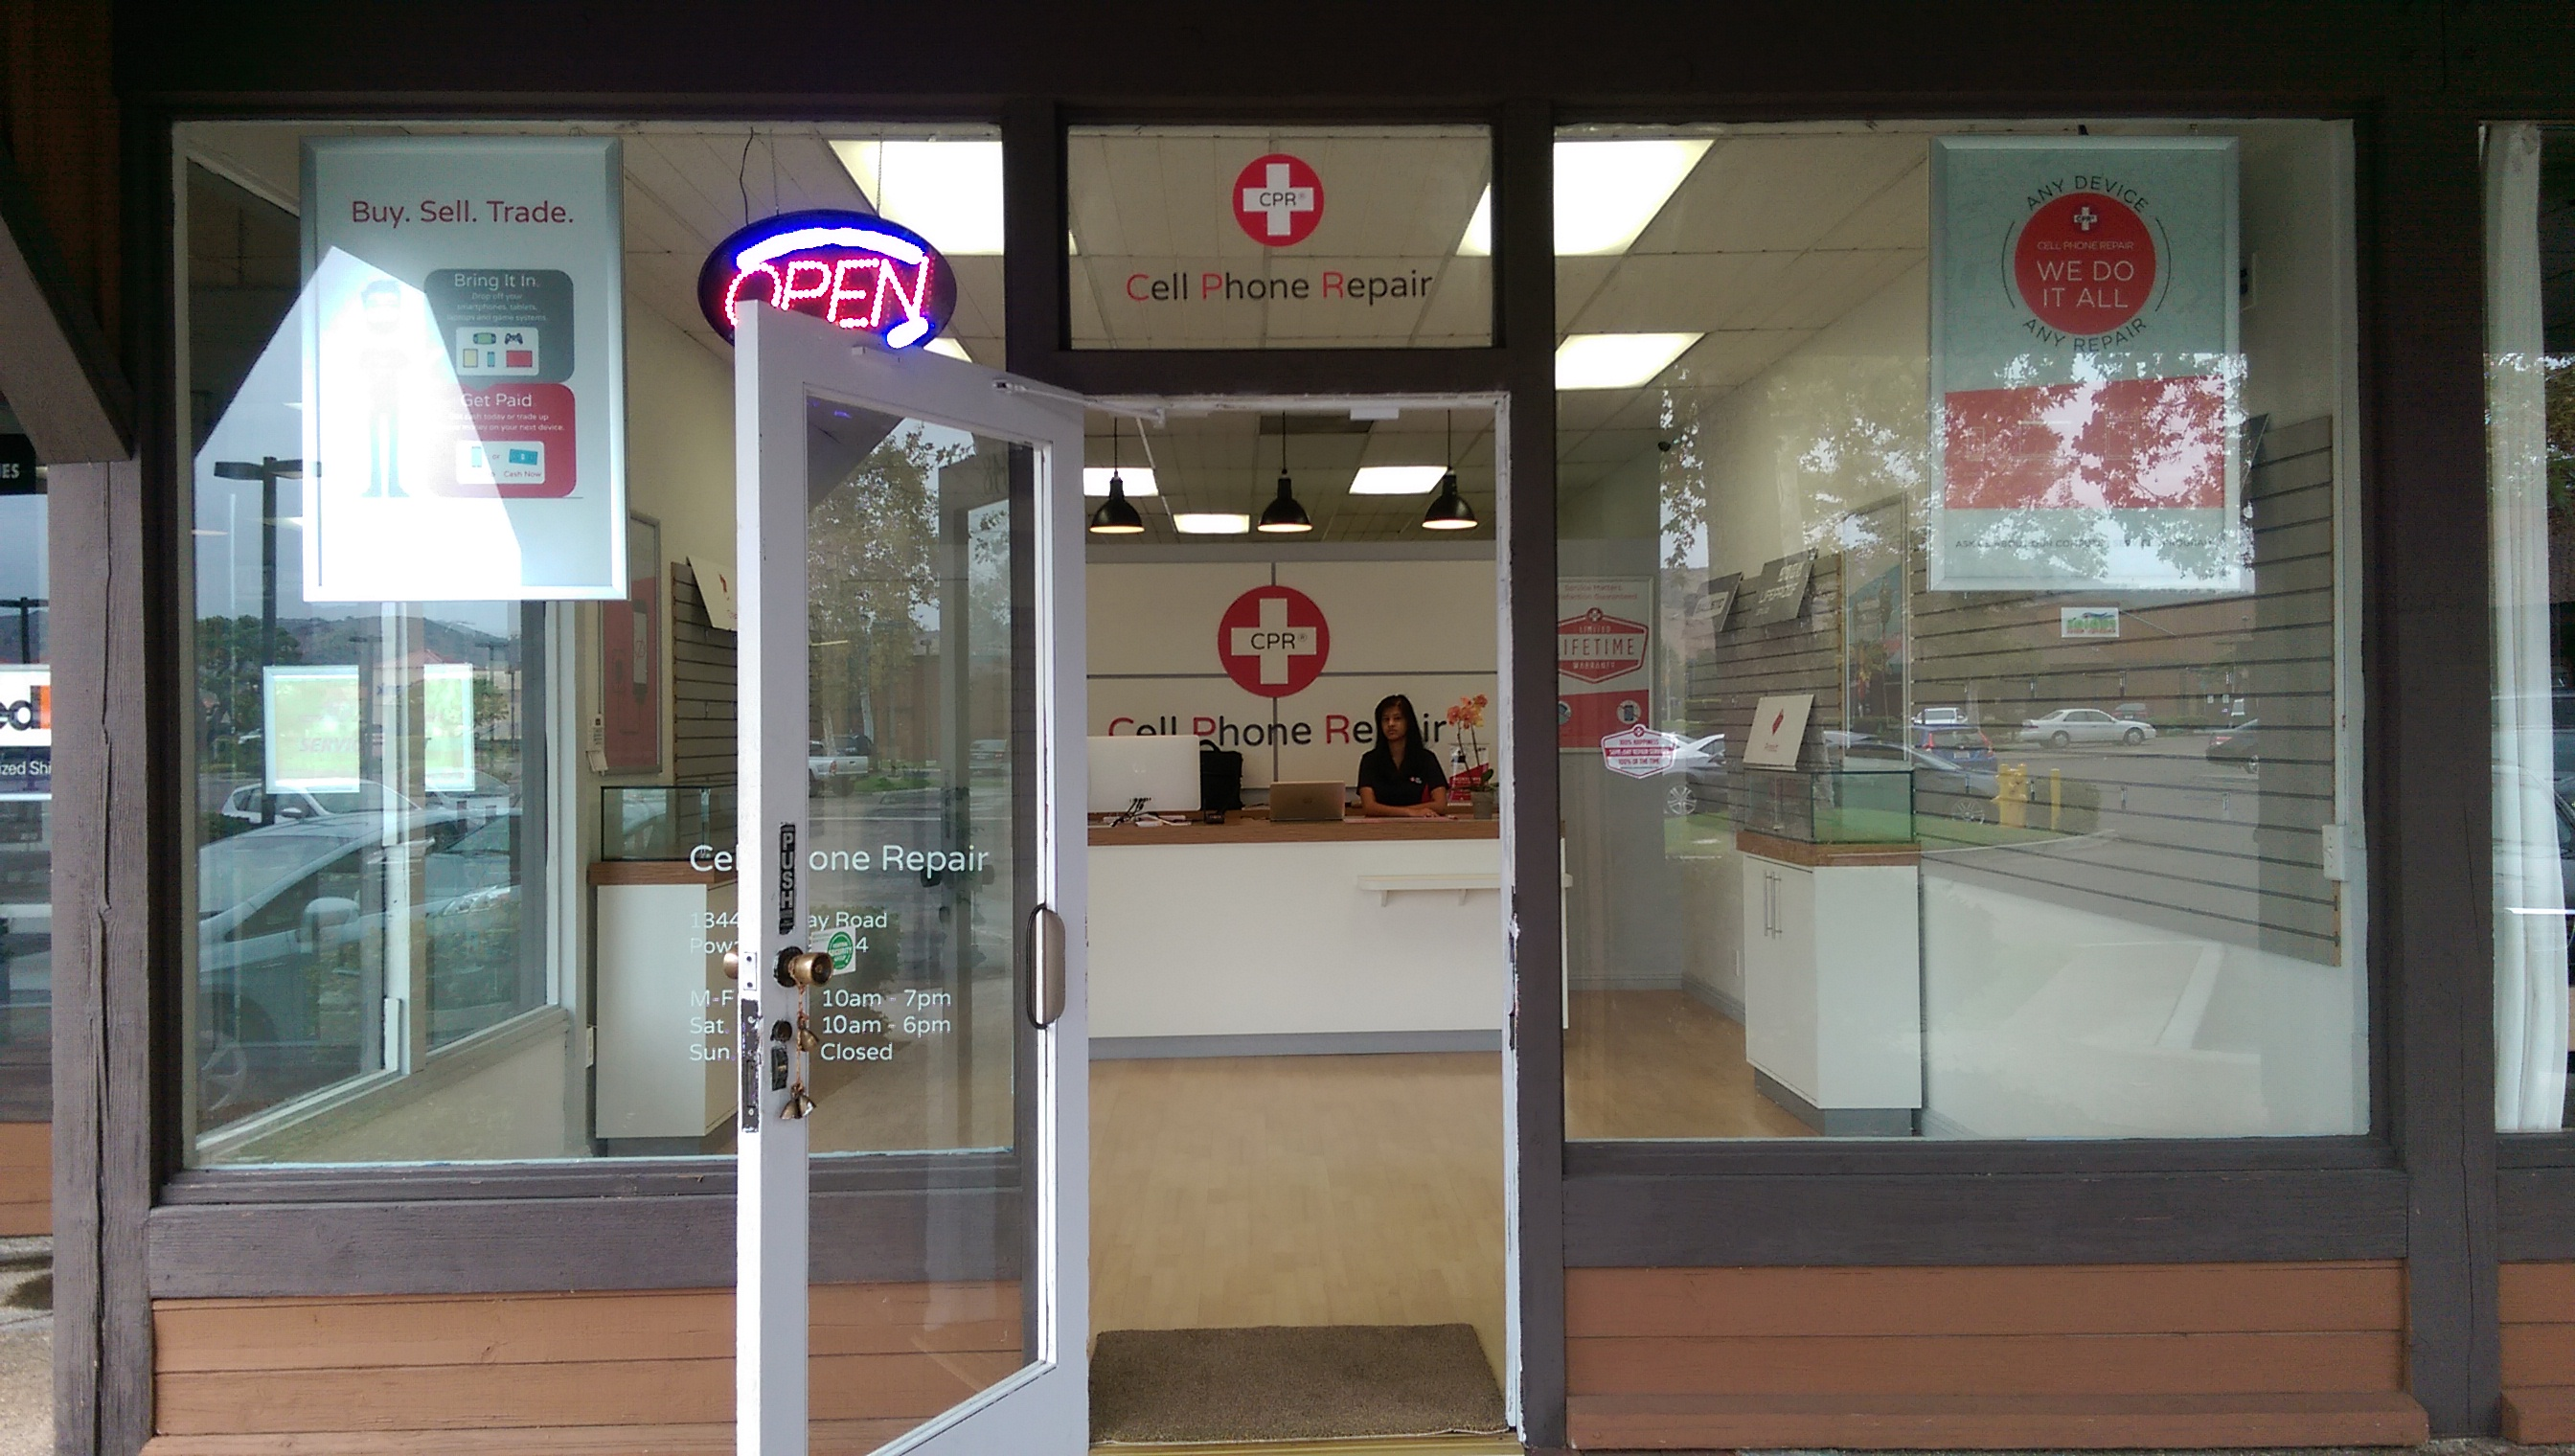 CPR Cell Phone Repair Poway image 5